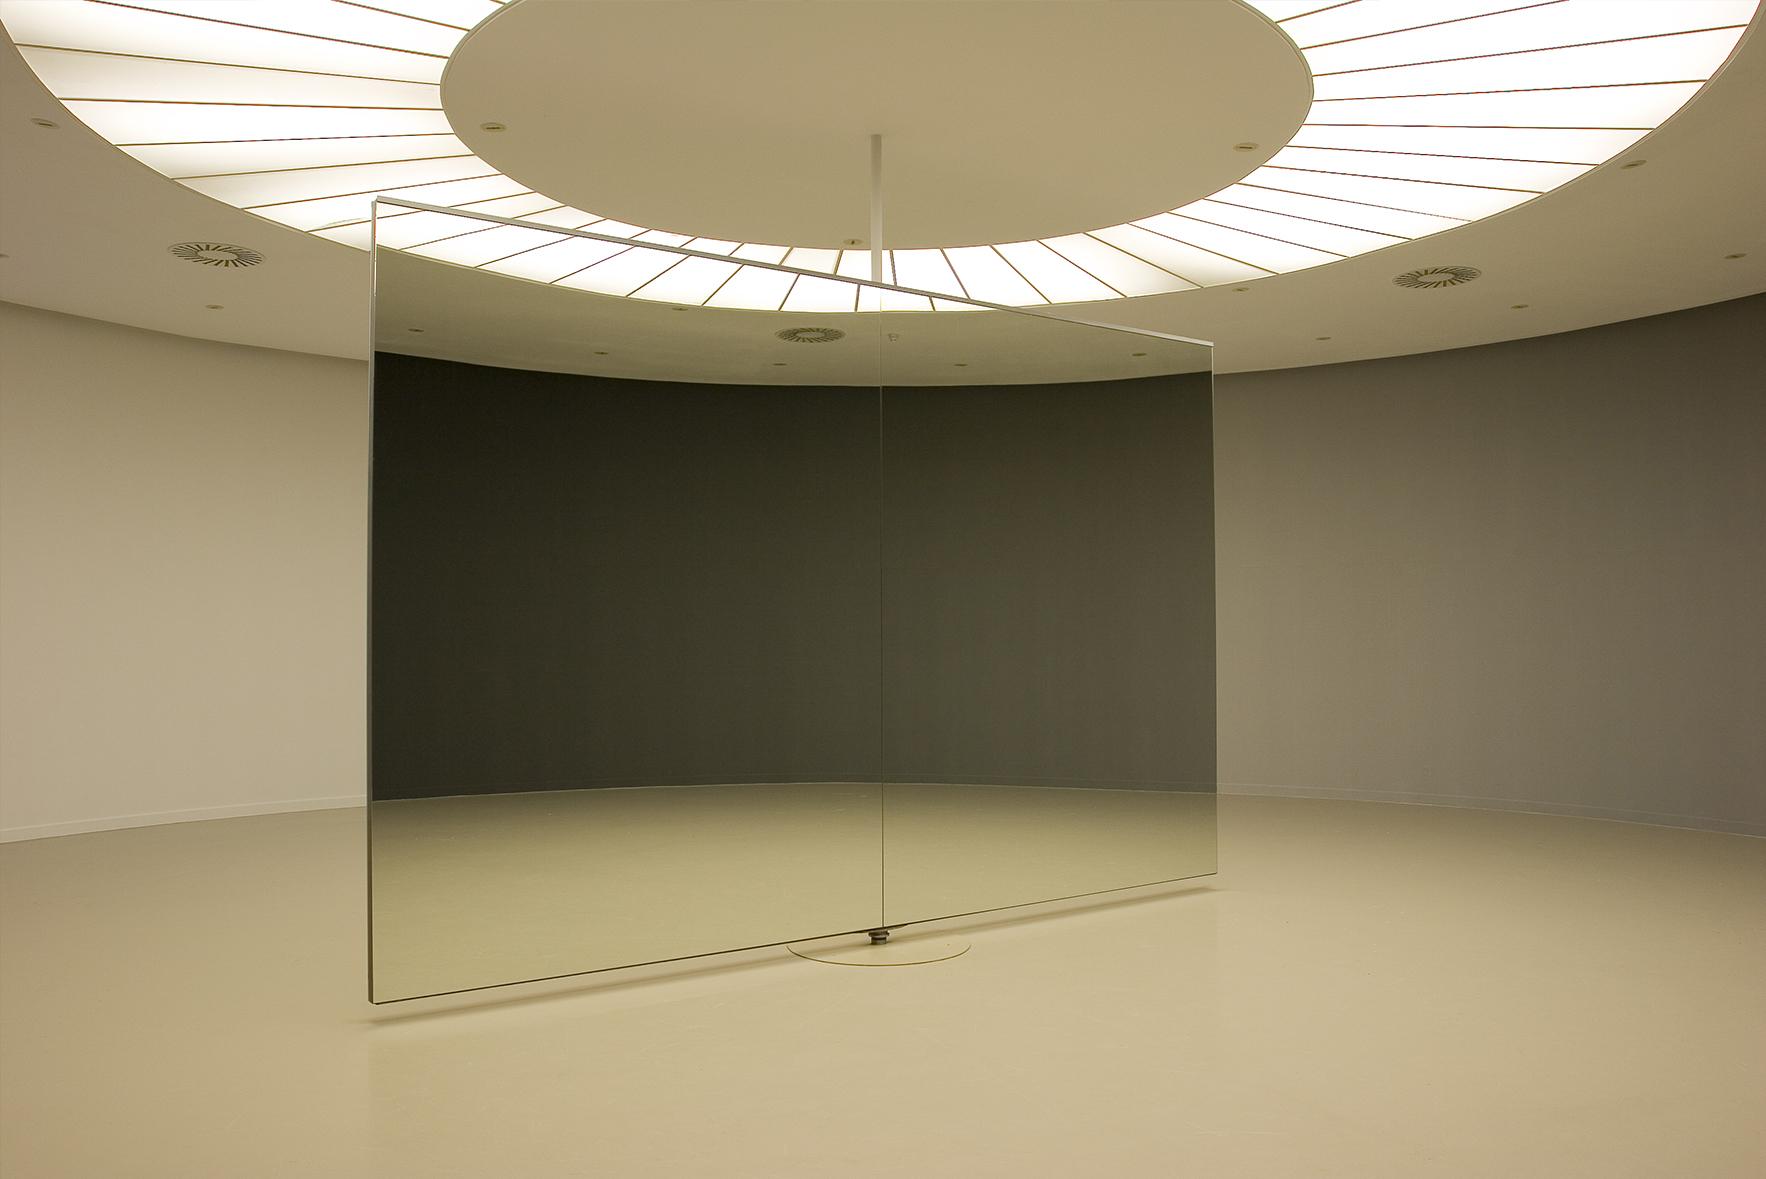 Untitled, 2006 |  | ProjecteSD